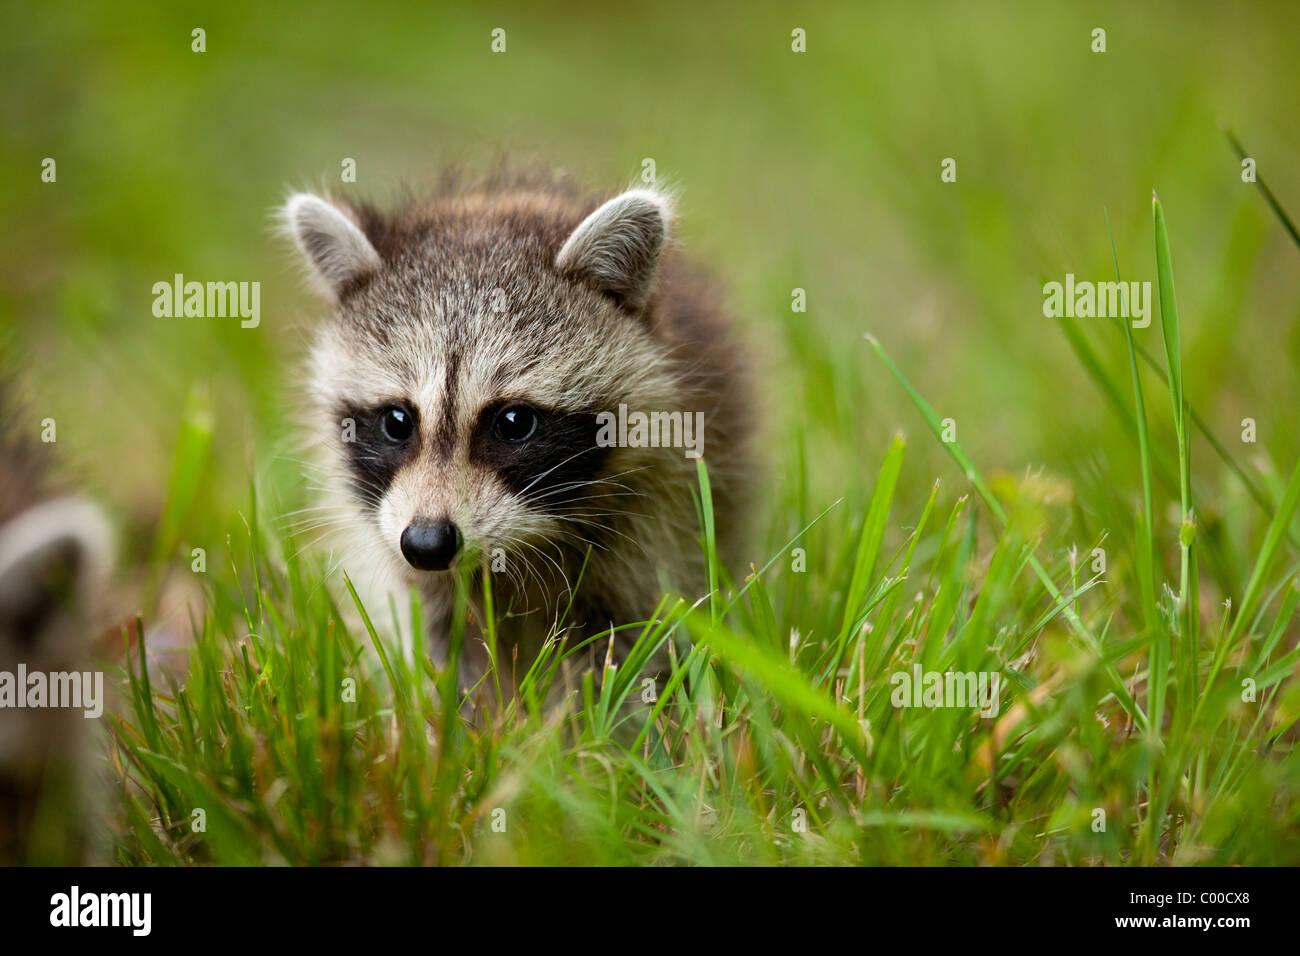 Stati Uniti d'America, Maryland, Assateague Island National Seashore, giovani Raccoon (Procione lotor) passeggiate Immagini Stock